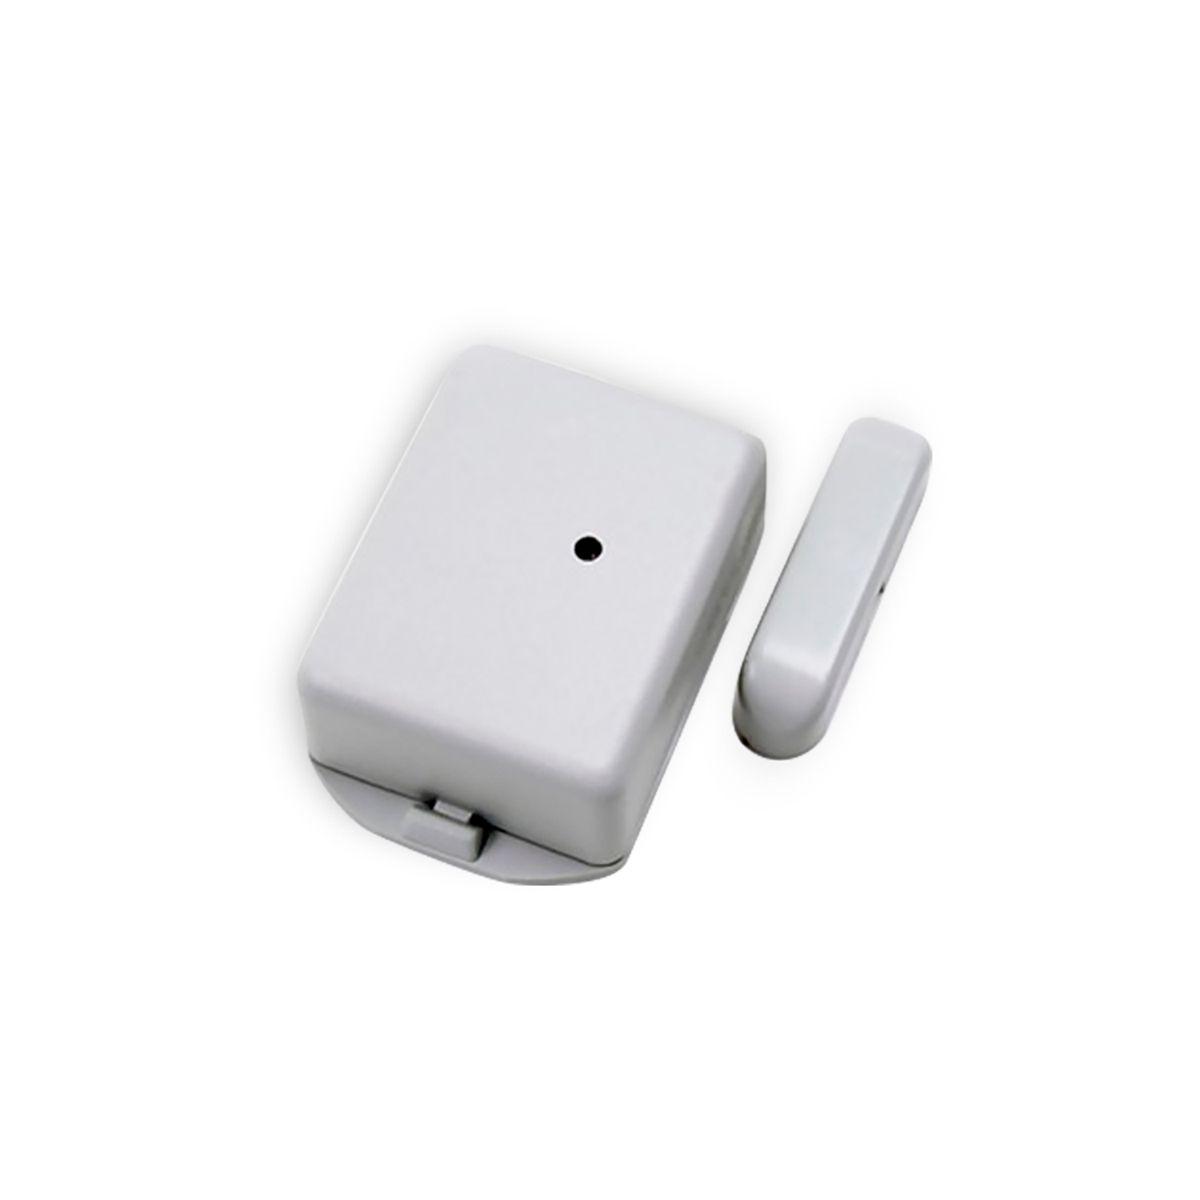 Kit Alarme Residencial PPA 7 Sensores Sem Fio e Discadora